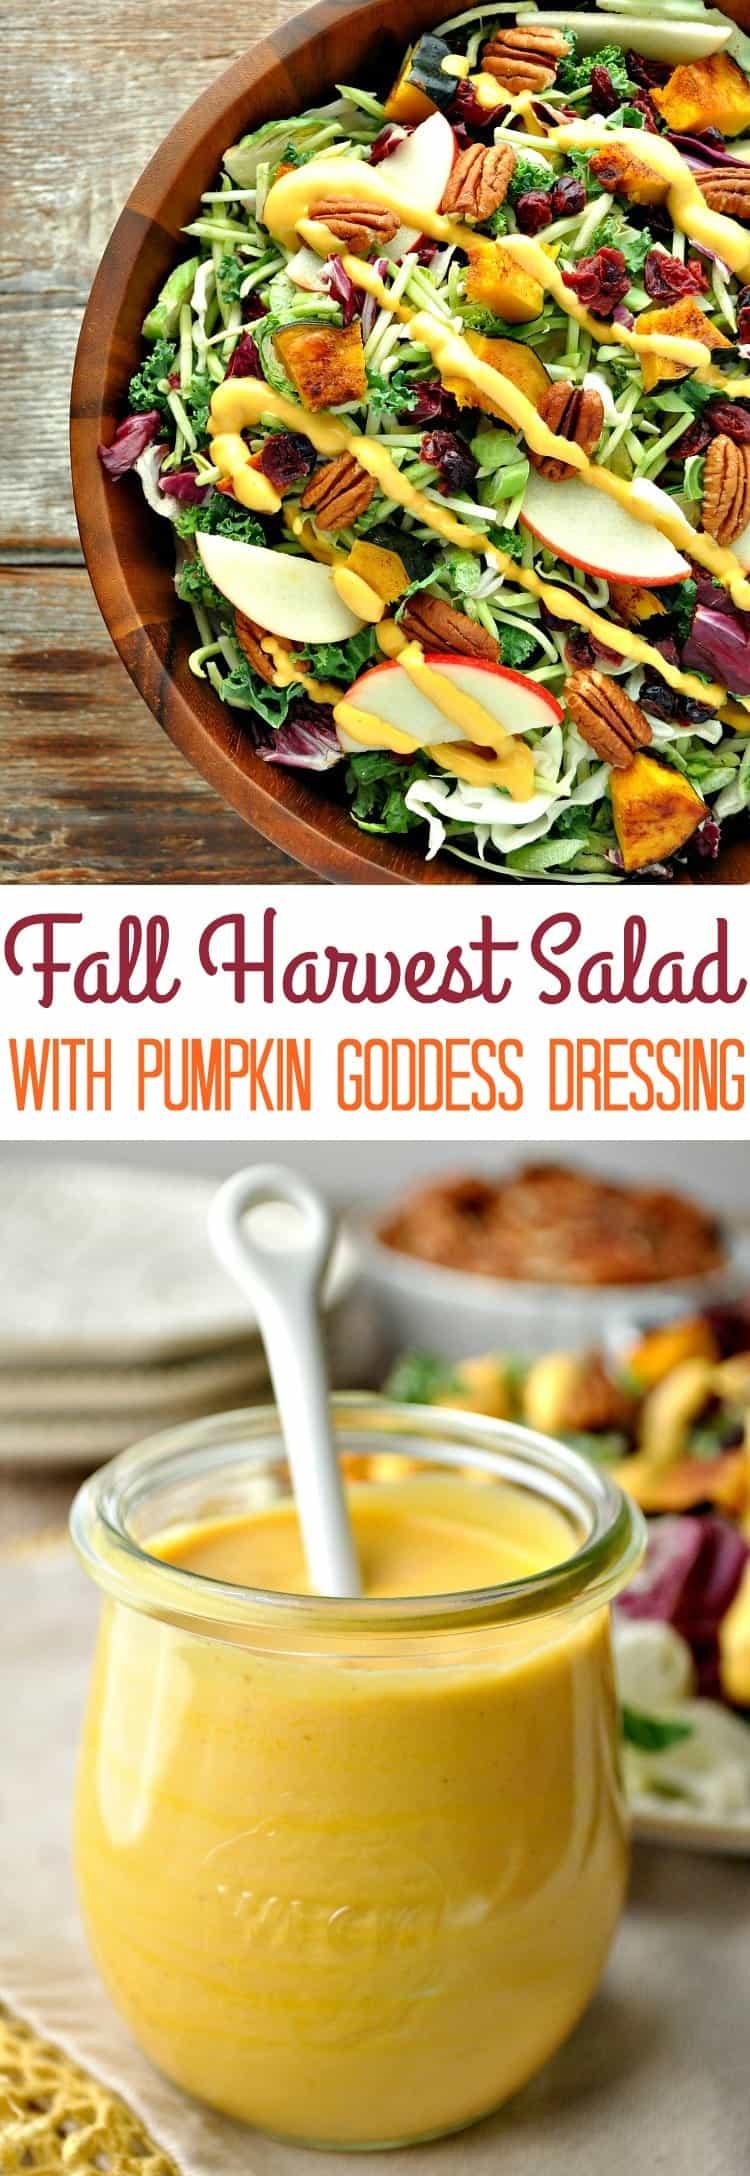 Fall Harvest Salad with Pumpkin Goddess Dressing